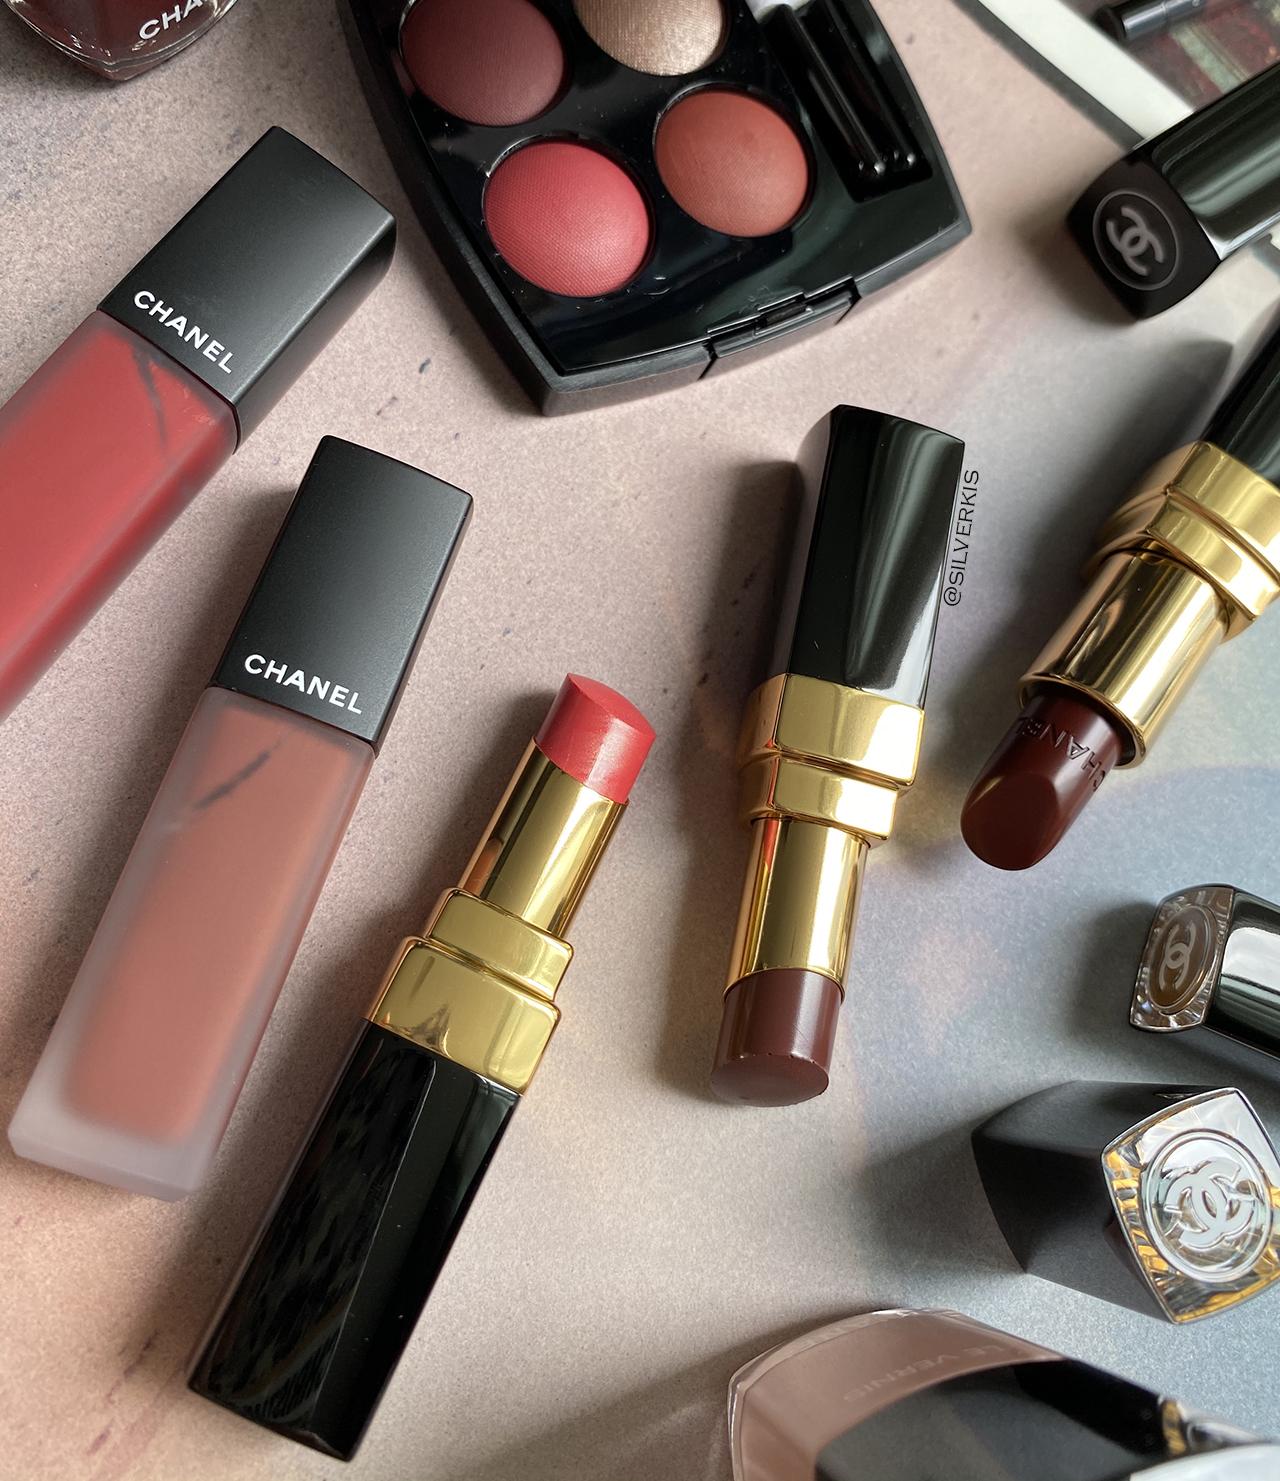 Chanel Fall-Winter 2020 lipsticks